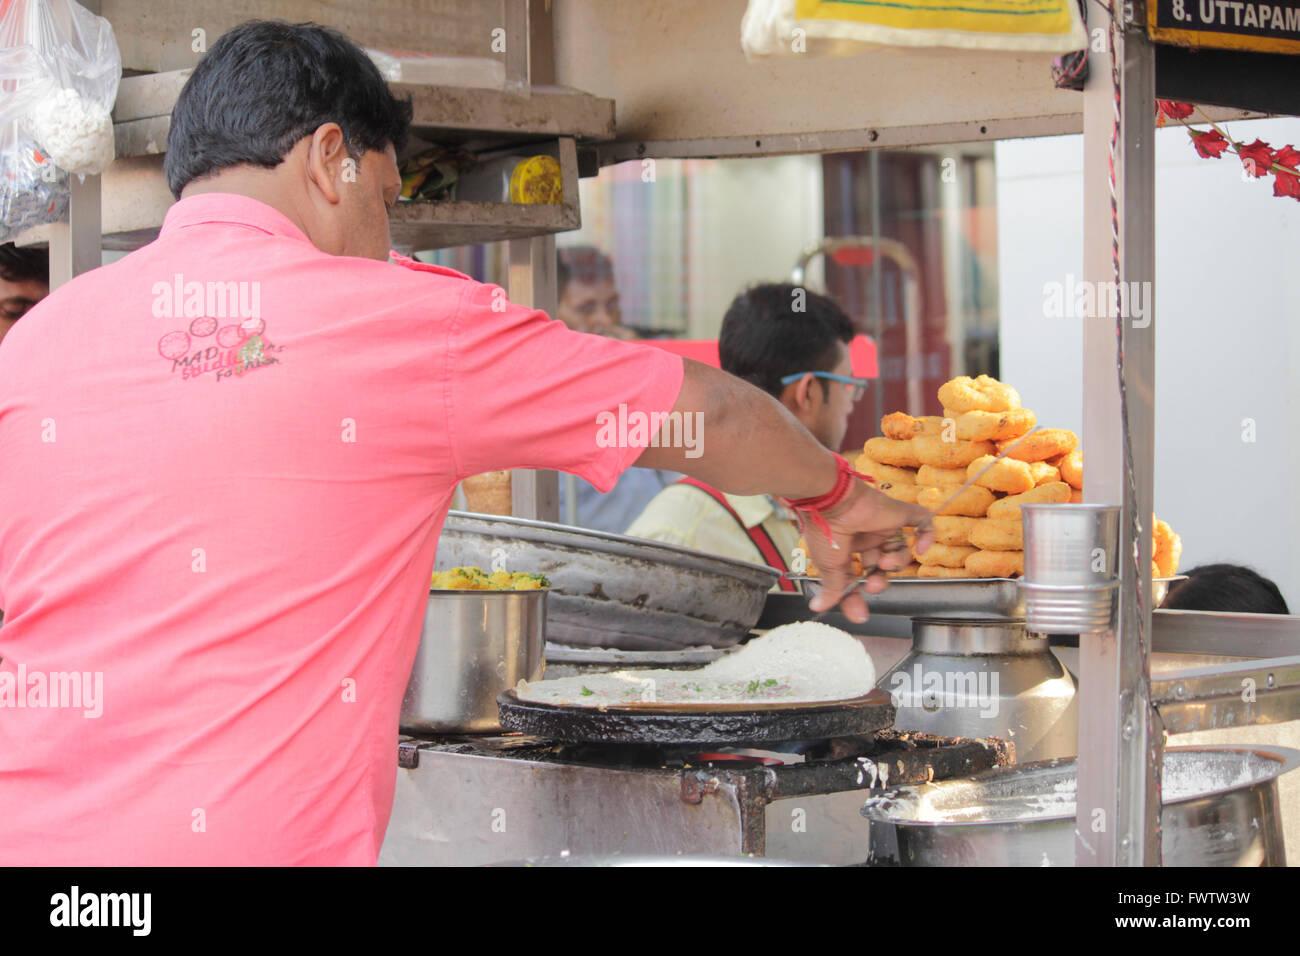 Street food, Kolkata, India - Stock Image